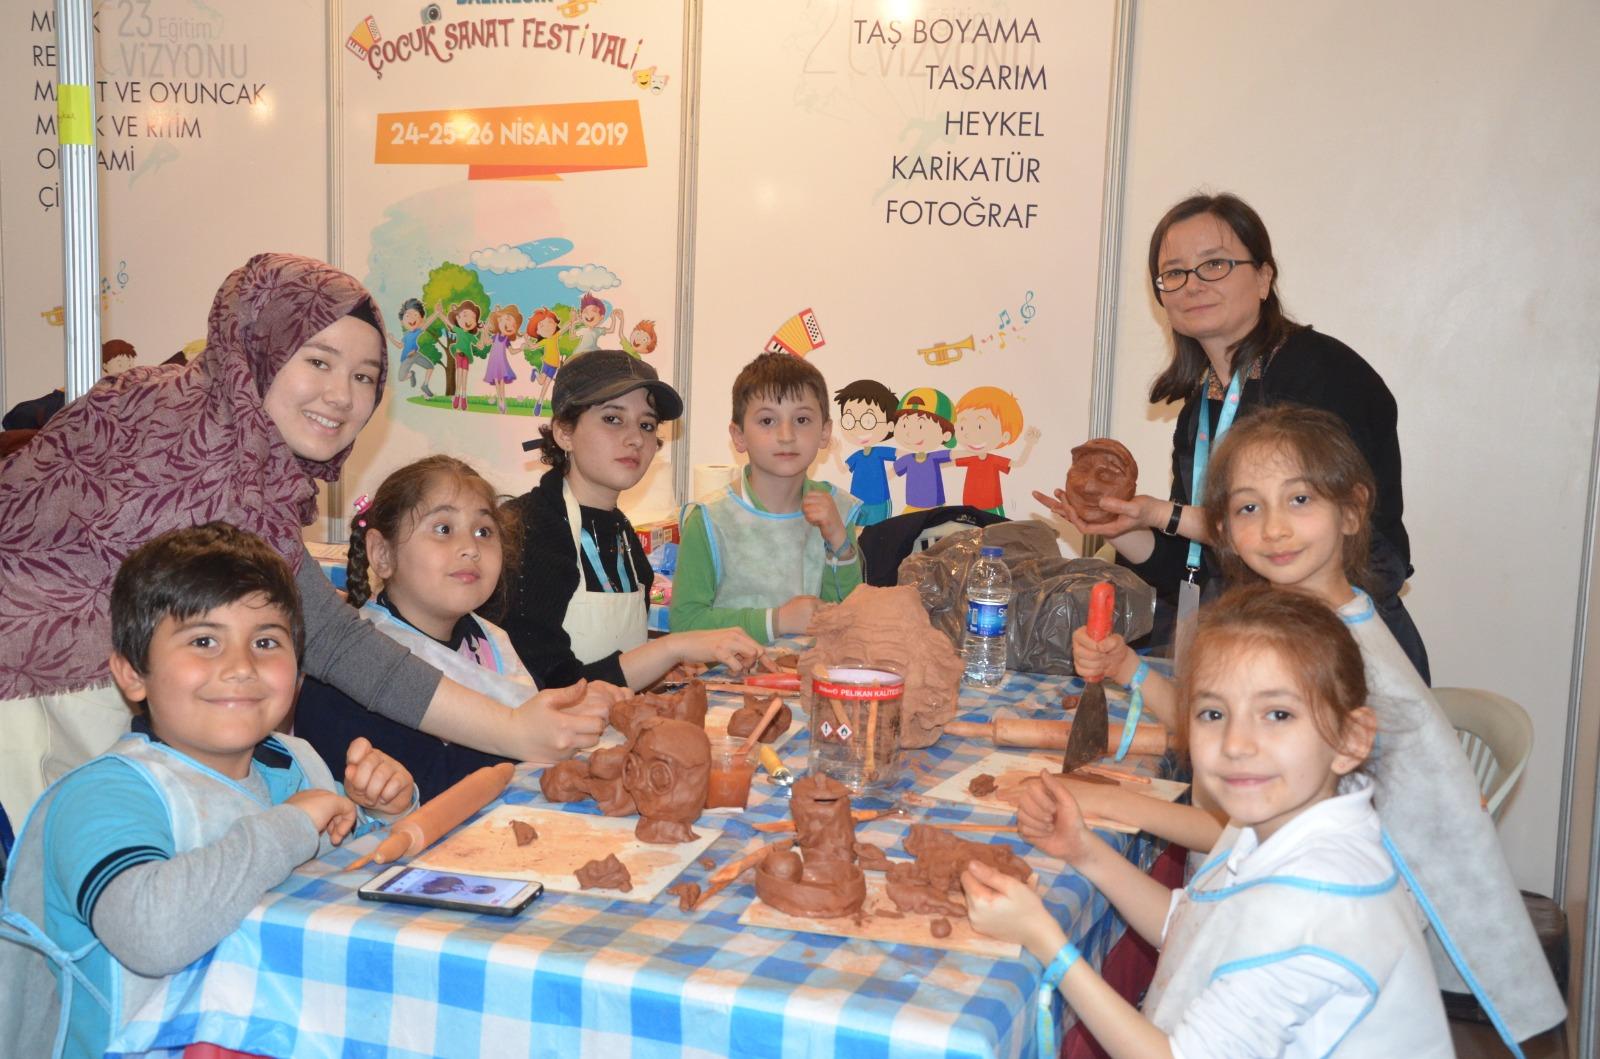 Çocuk Sanat Festivali